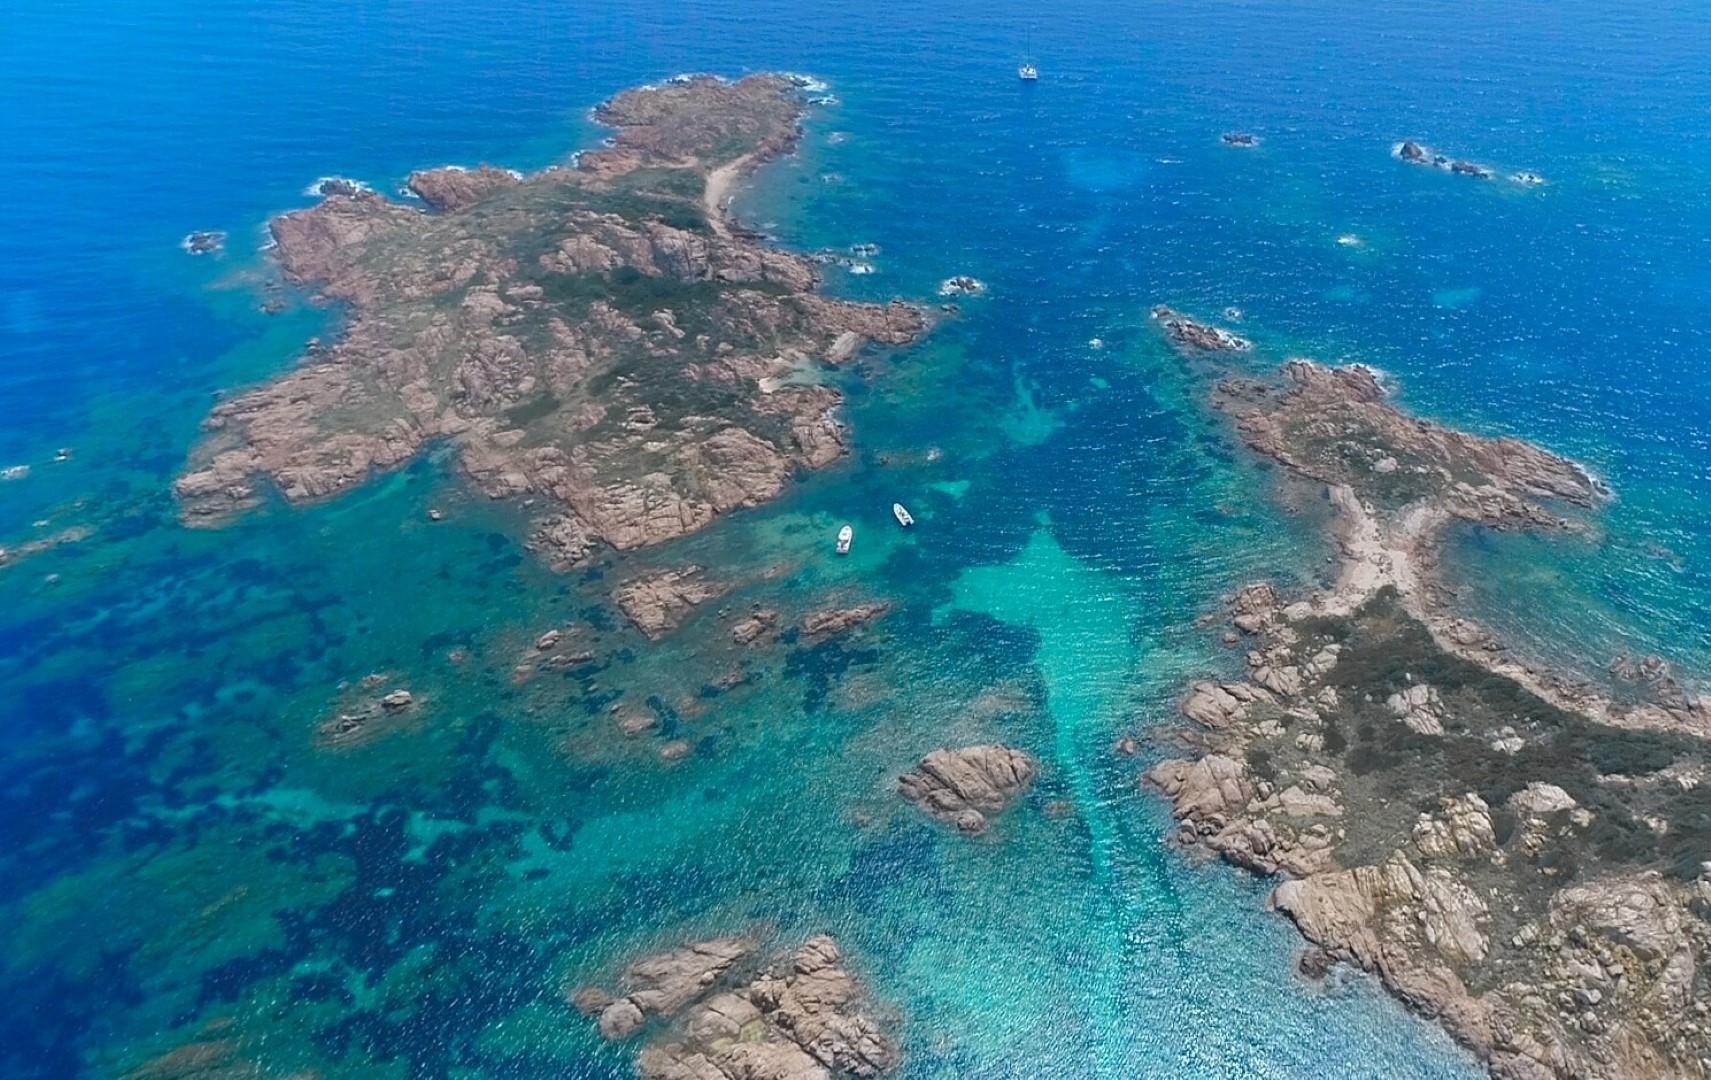 Donnavventura Summer Beach: la Sardegna